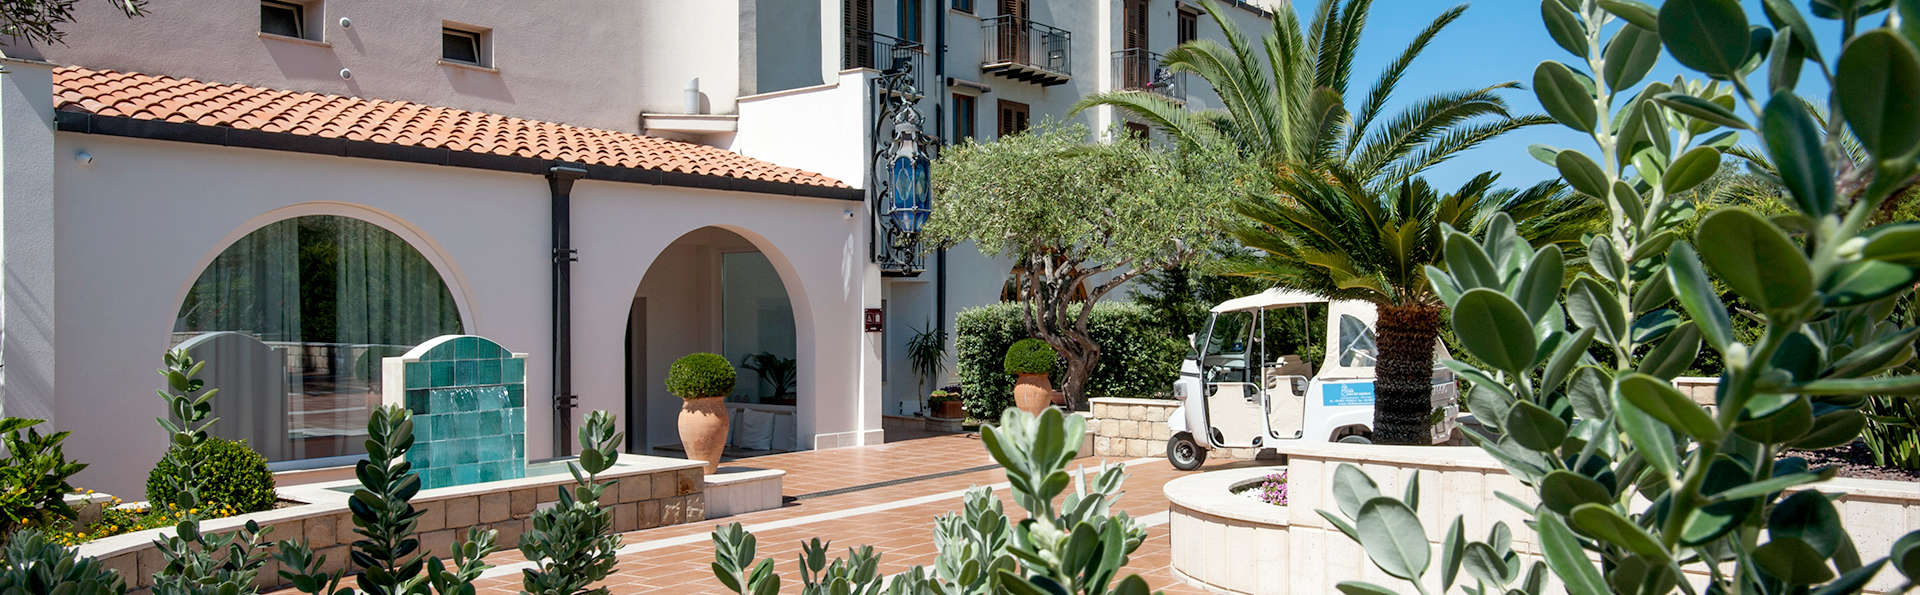 Hotel Baia del Capitano - Edit_Front2.jpg